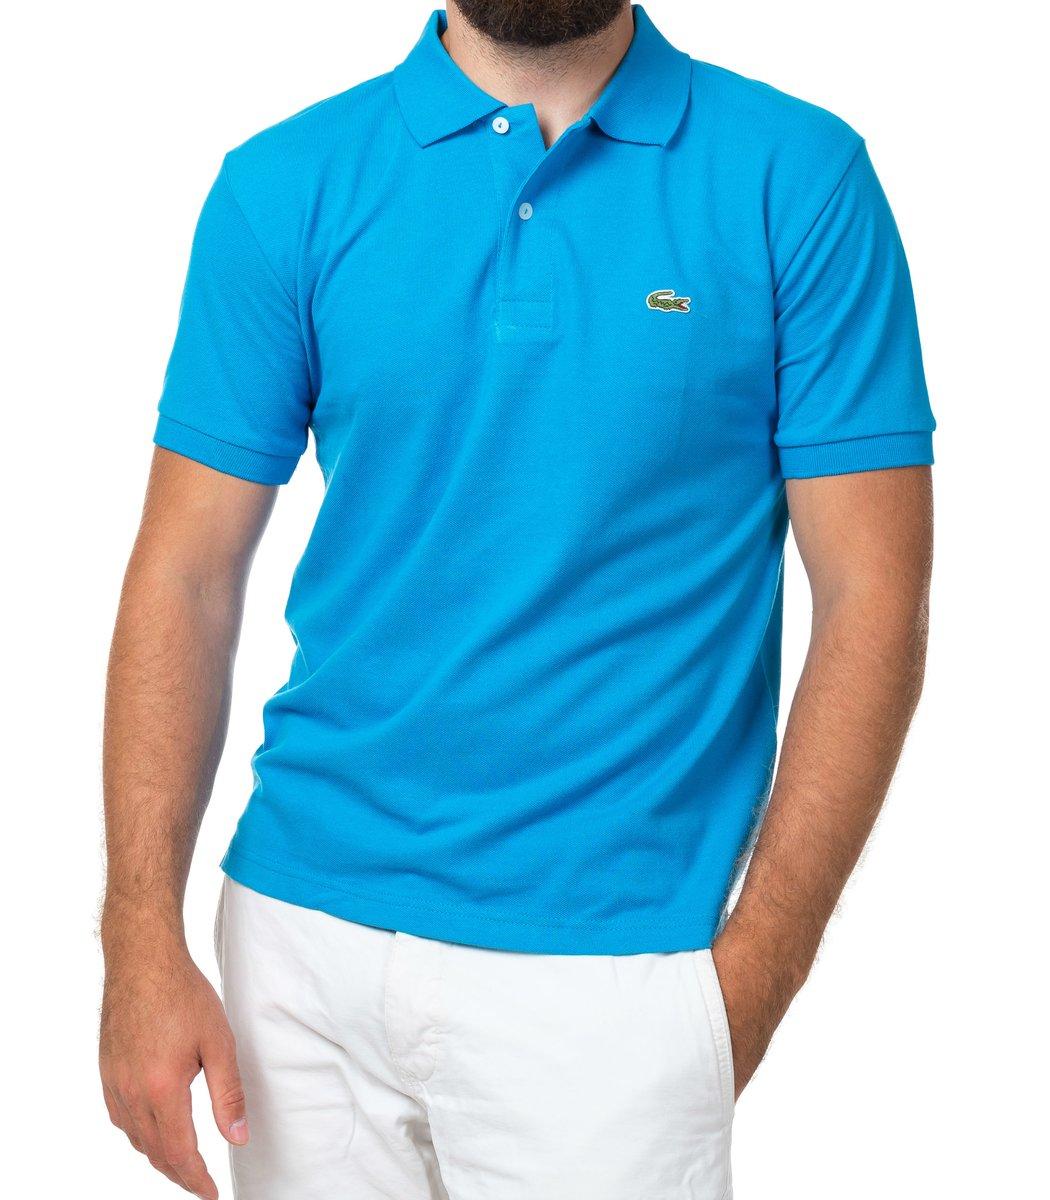 Мужская темно-голубая футболка поло Lacoste